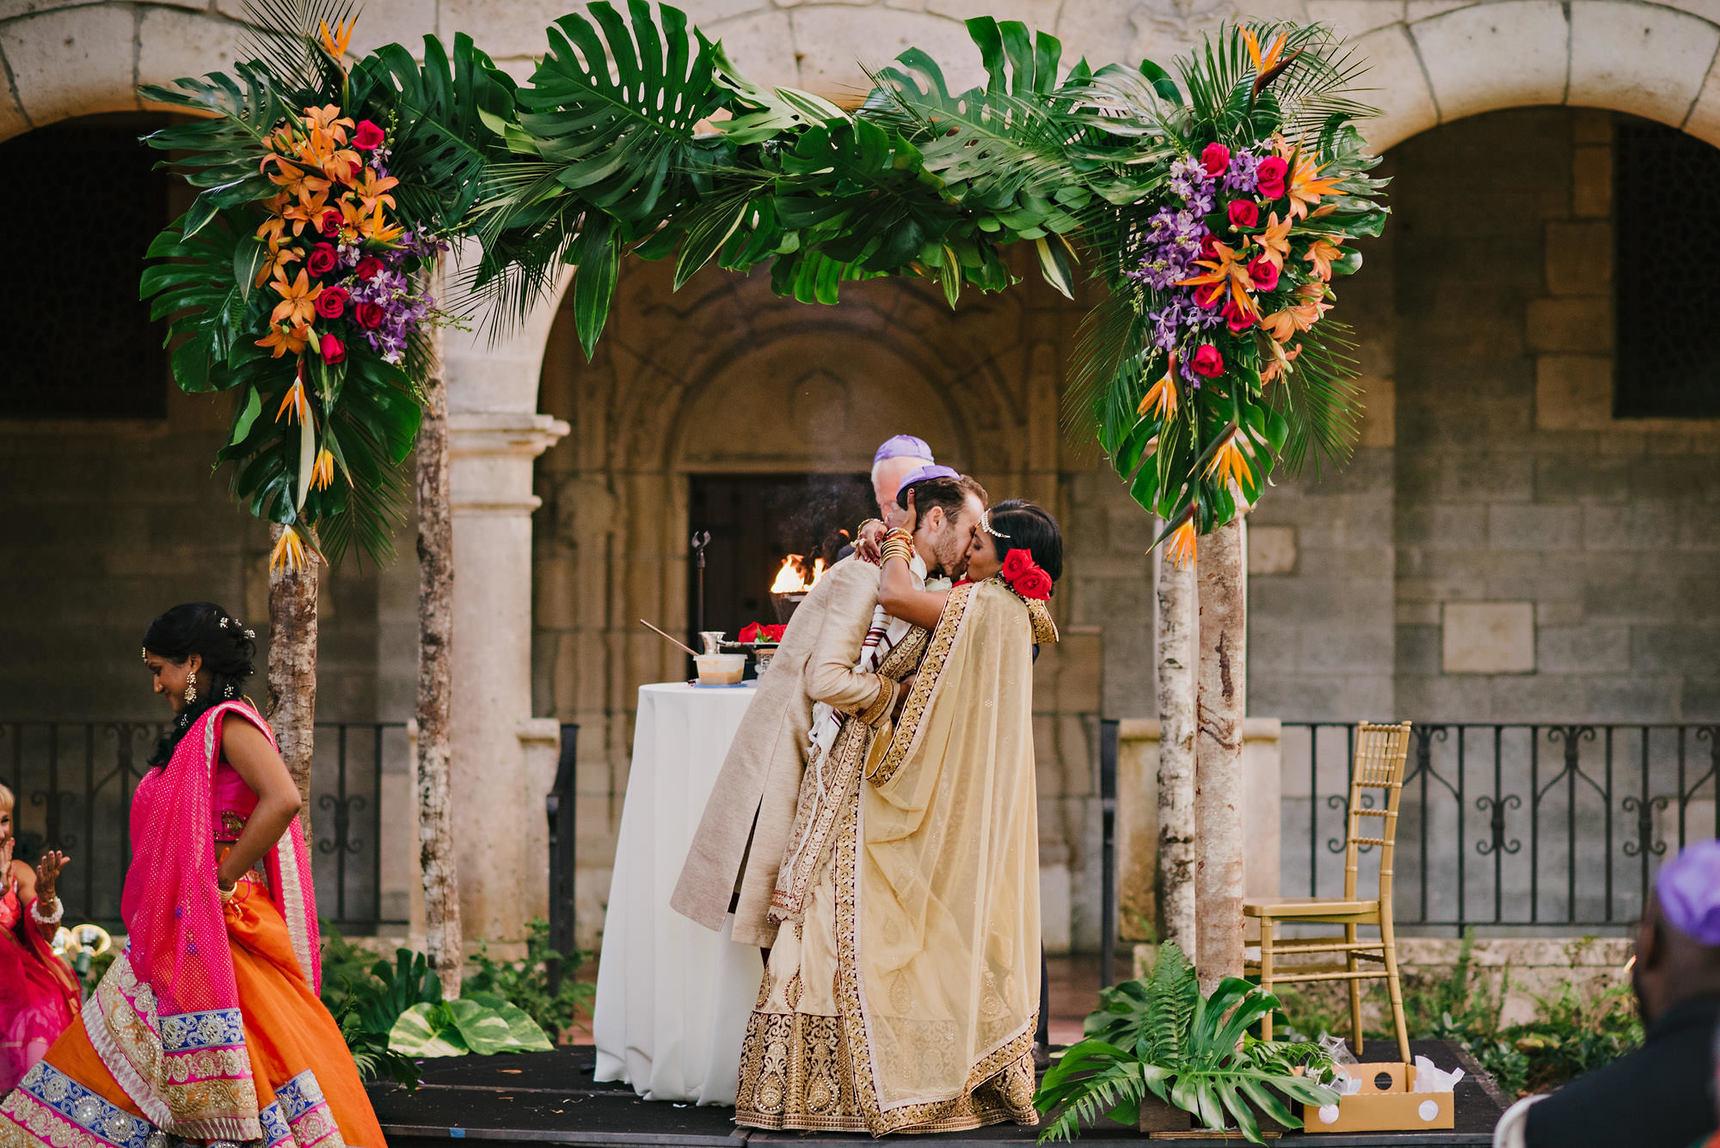 miami-luxury-catering-Wedding-Photography-73(pp_w1720_h1148).jpg